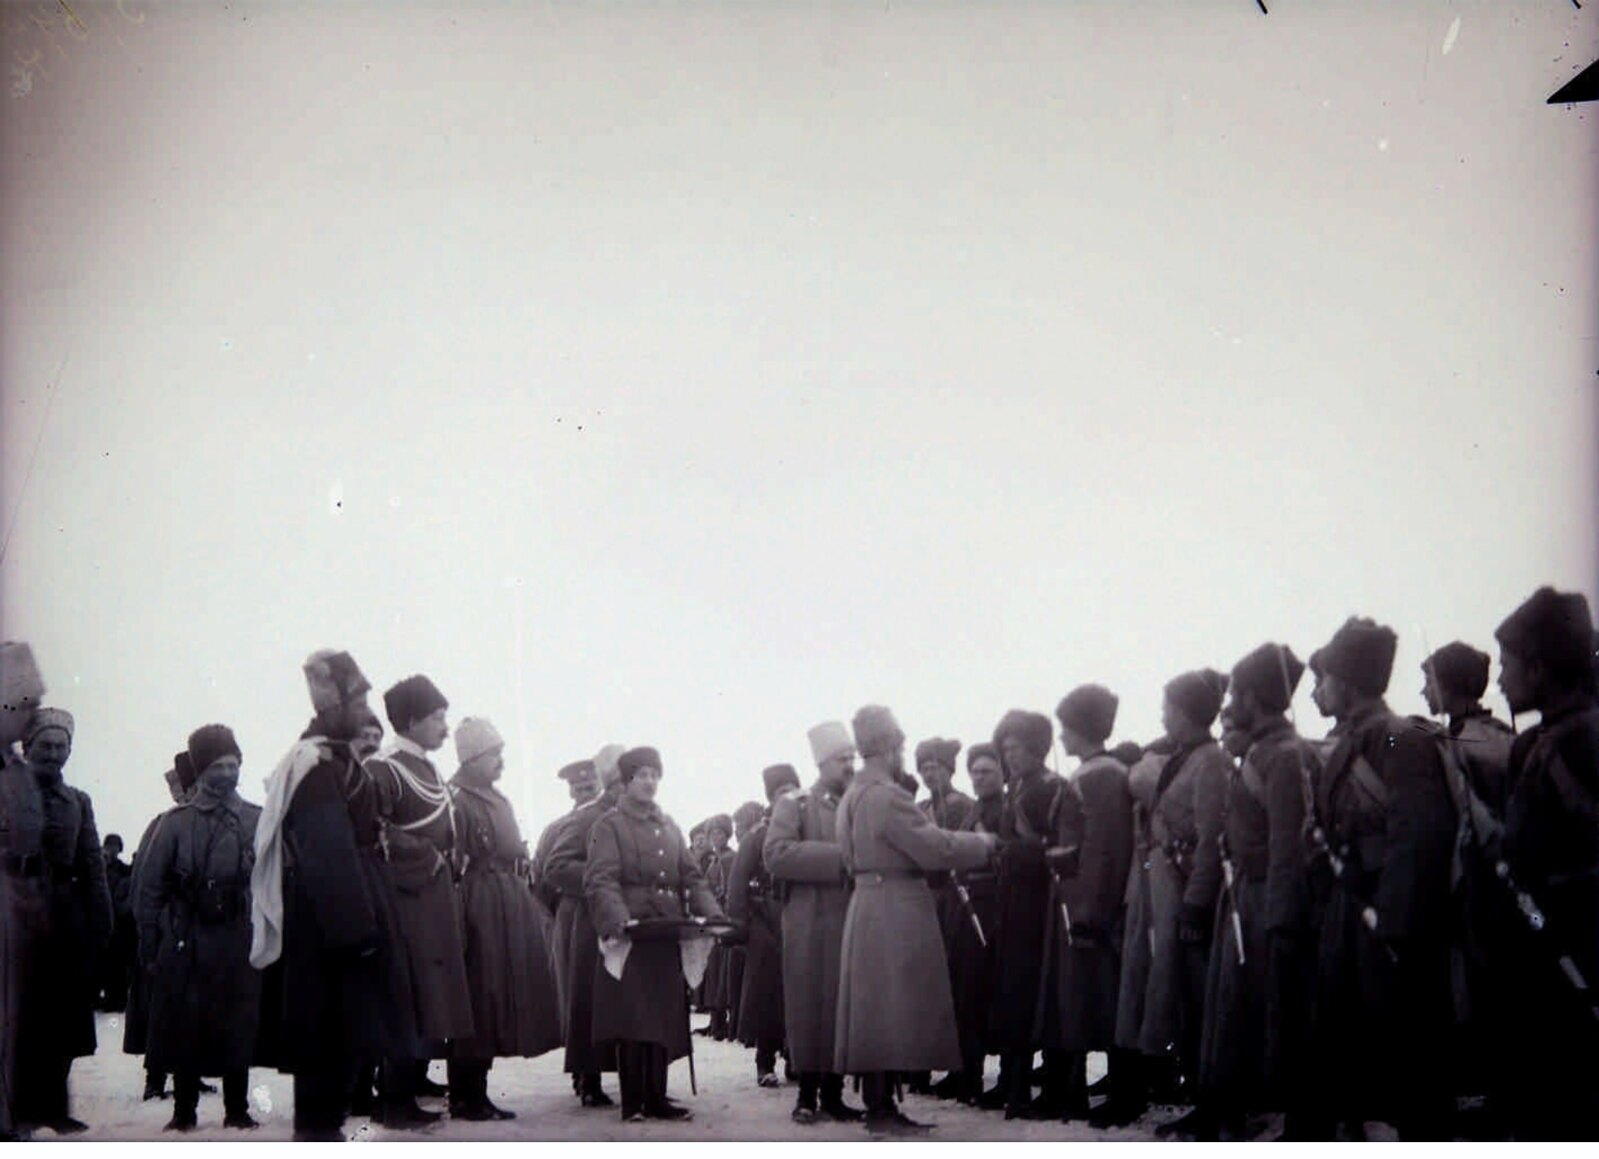 07. 1914. Николай II раздает награды нижним чинам – участникам боев за Сарыкамыш